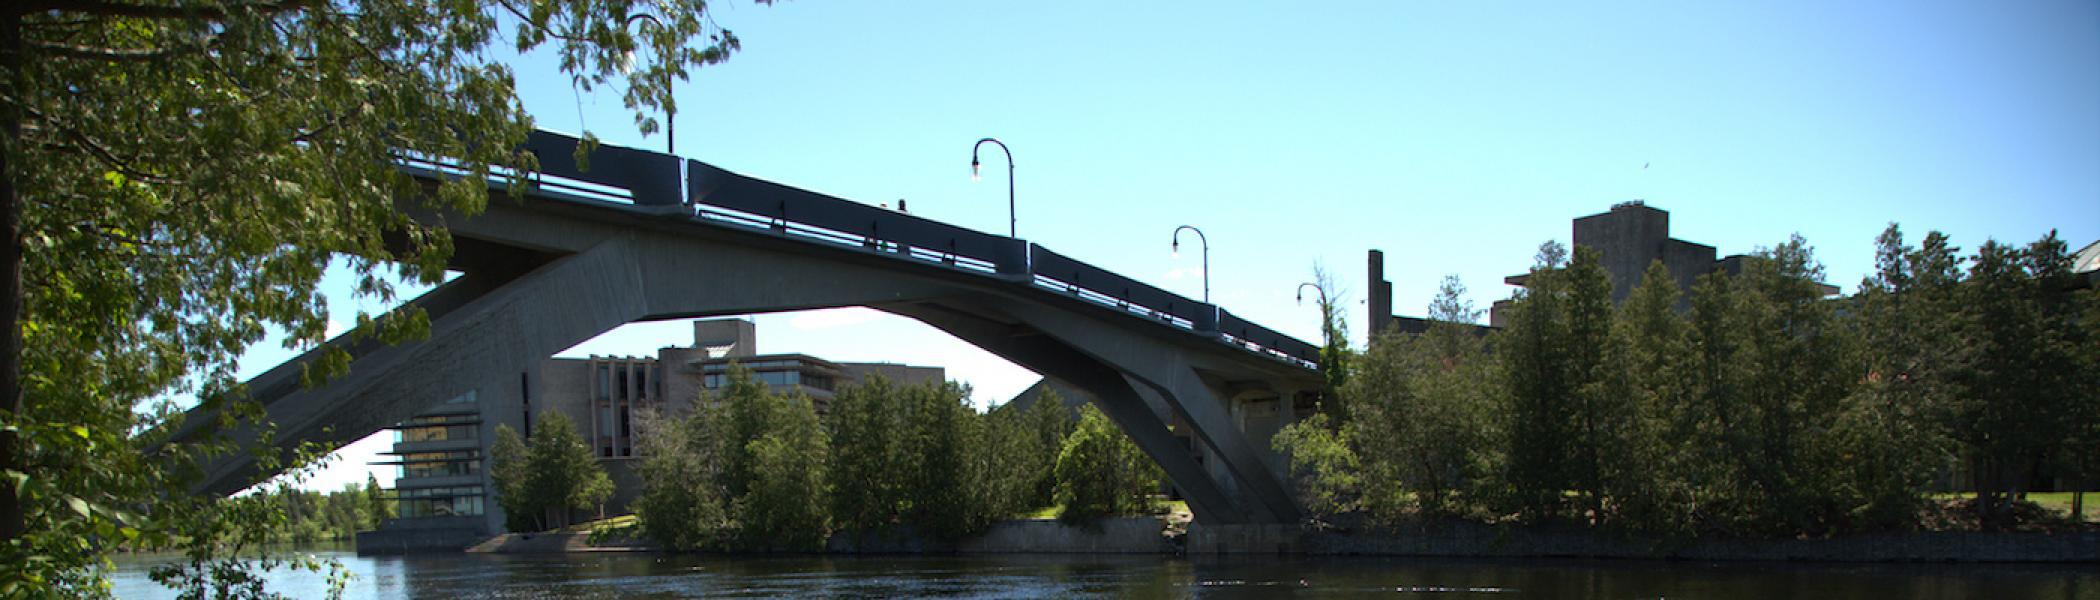 Trent University Fayron Bridge from a distance